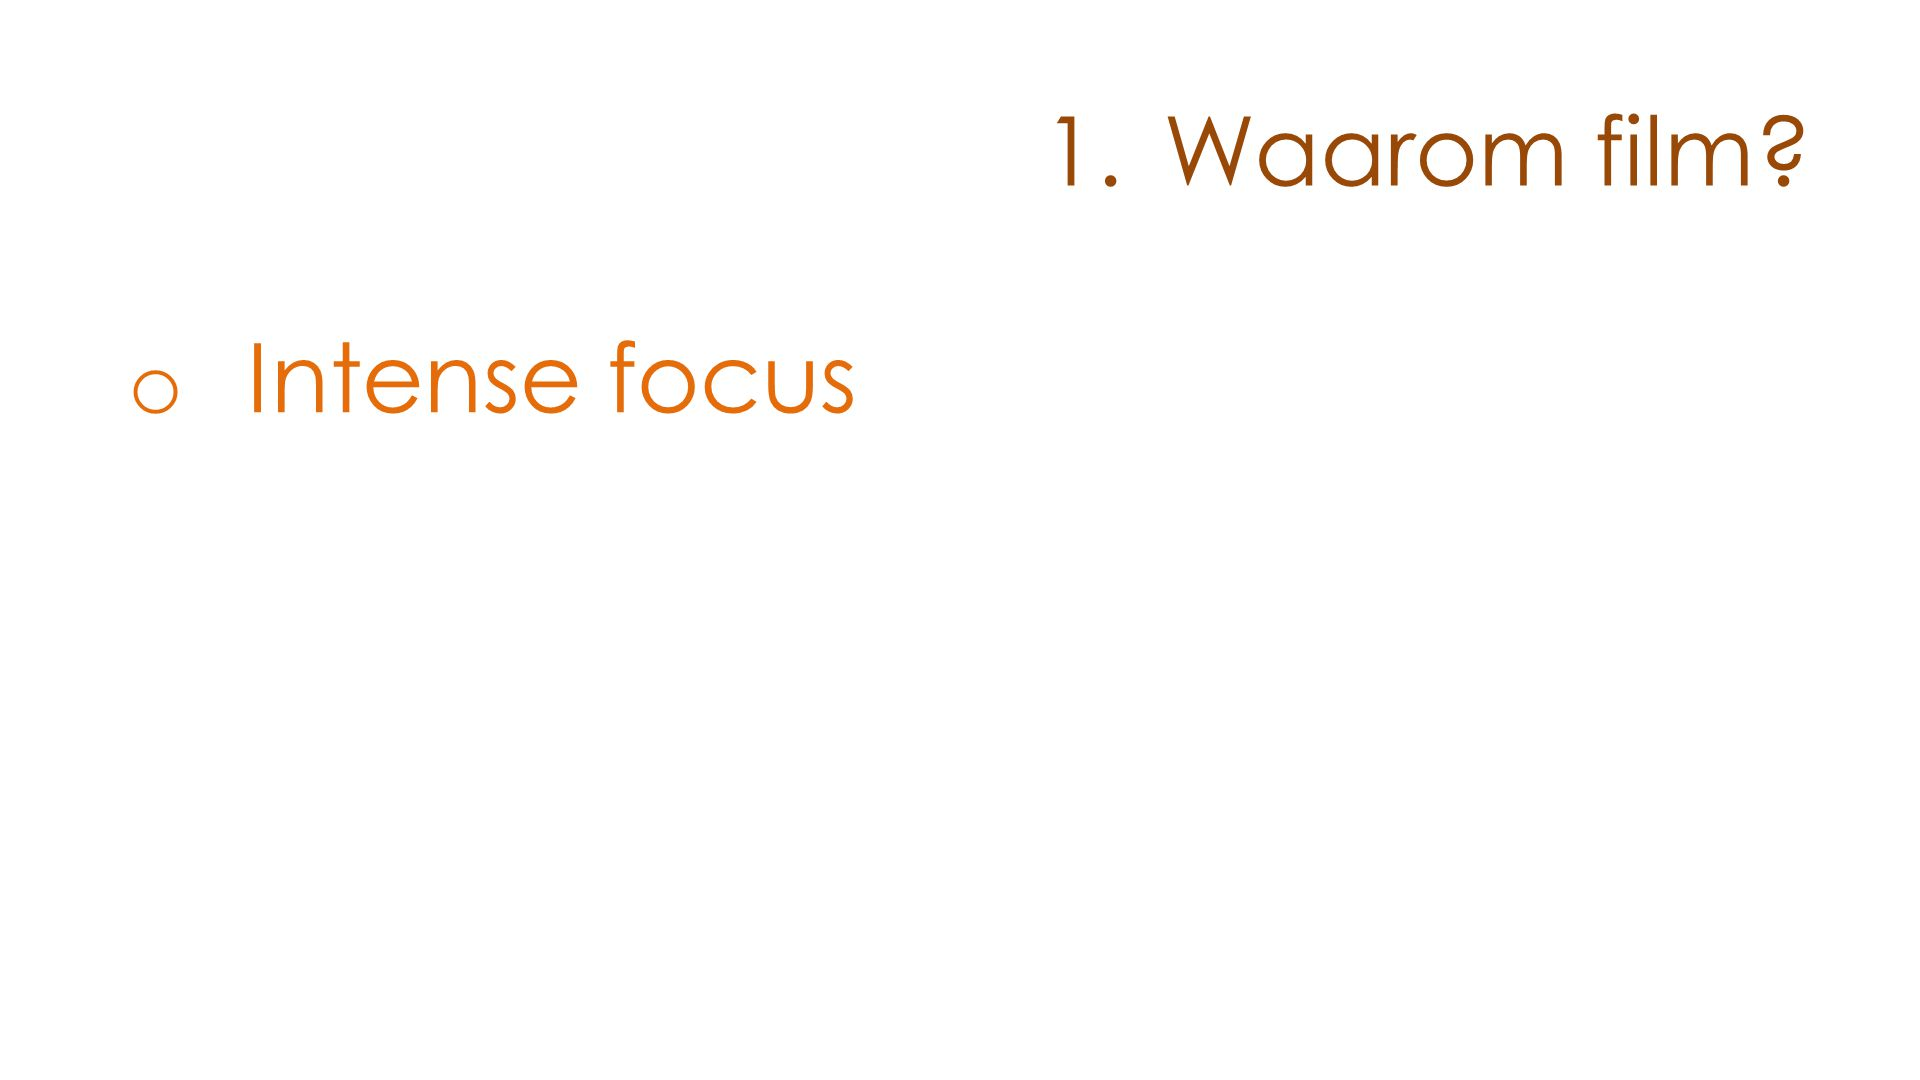 o Intense focus